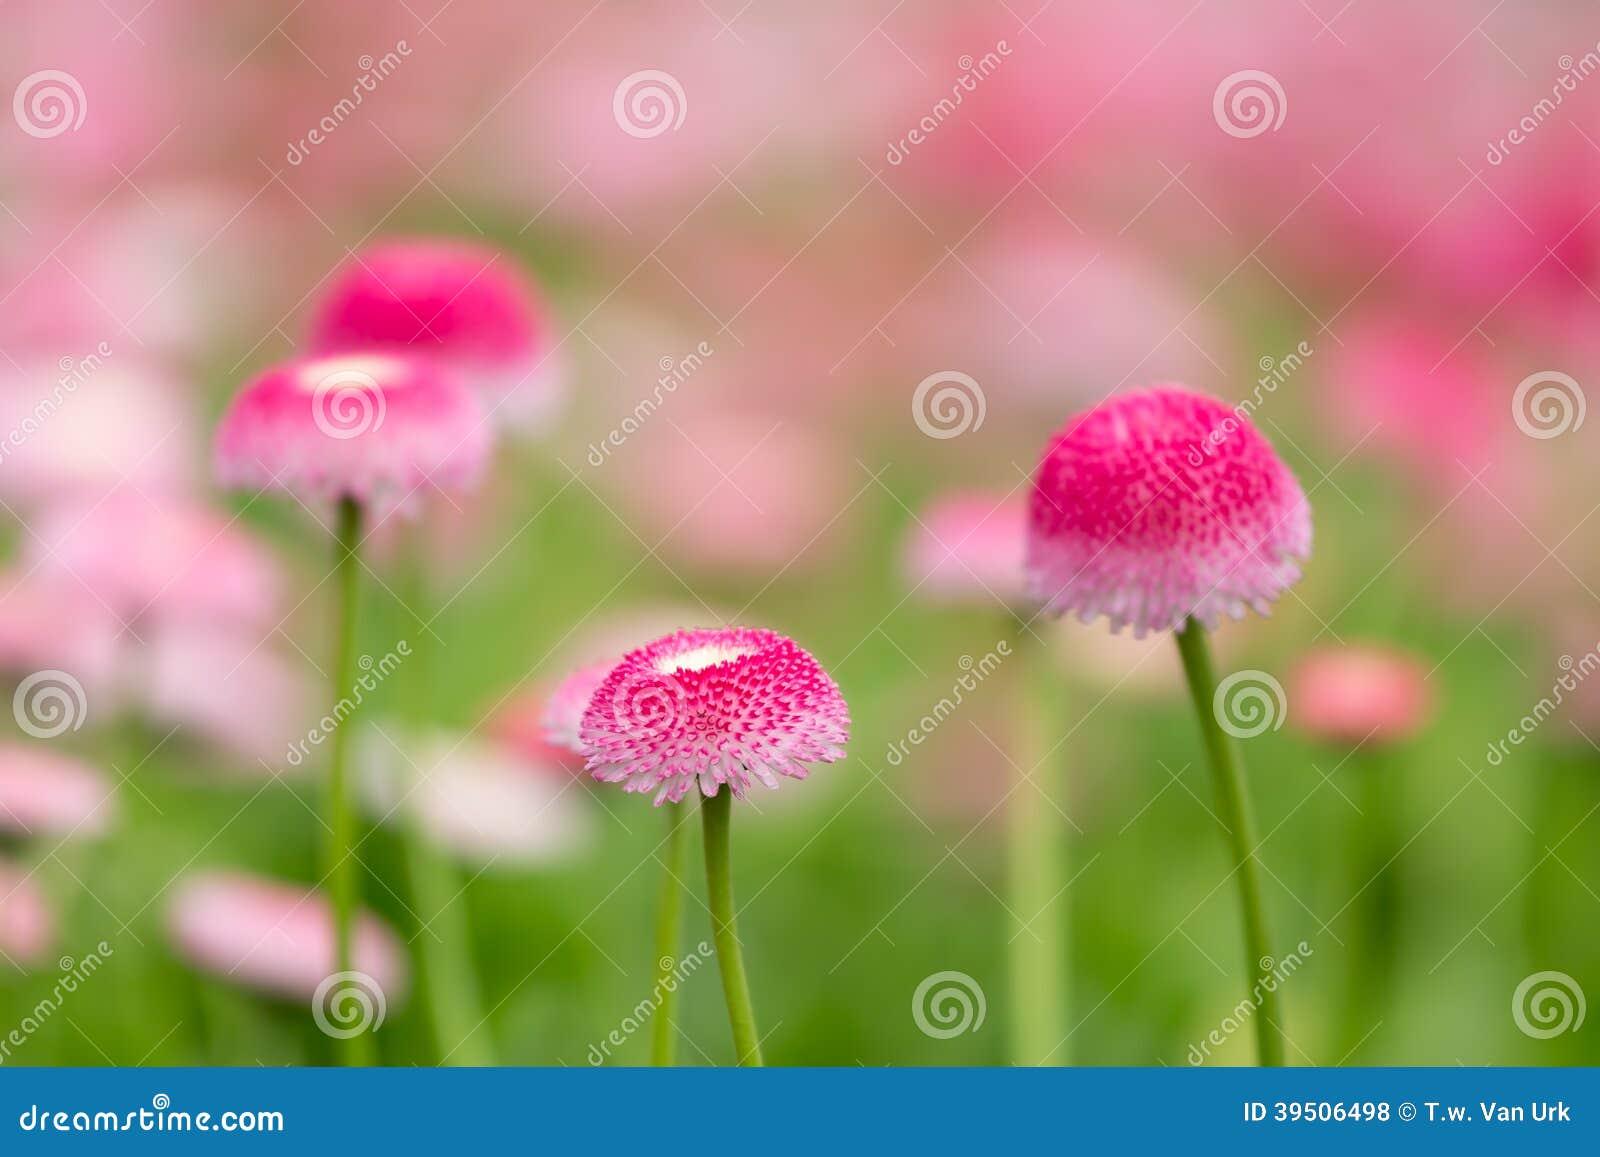 Purple bellis flowers with selective focus